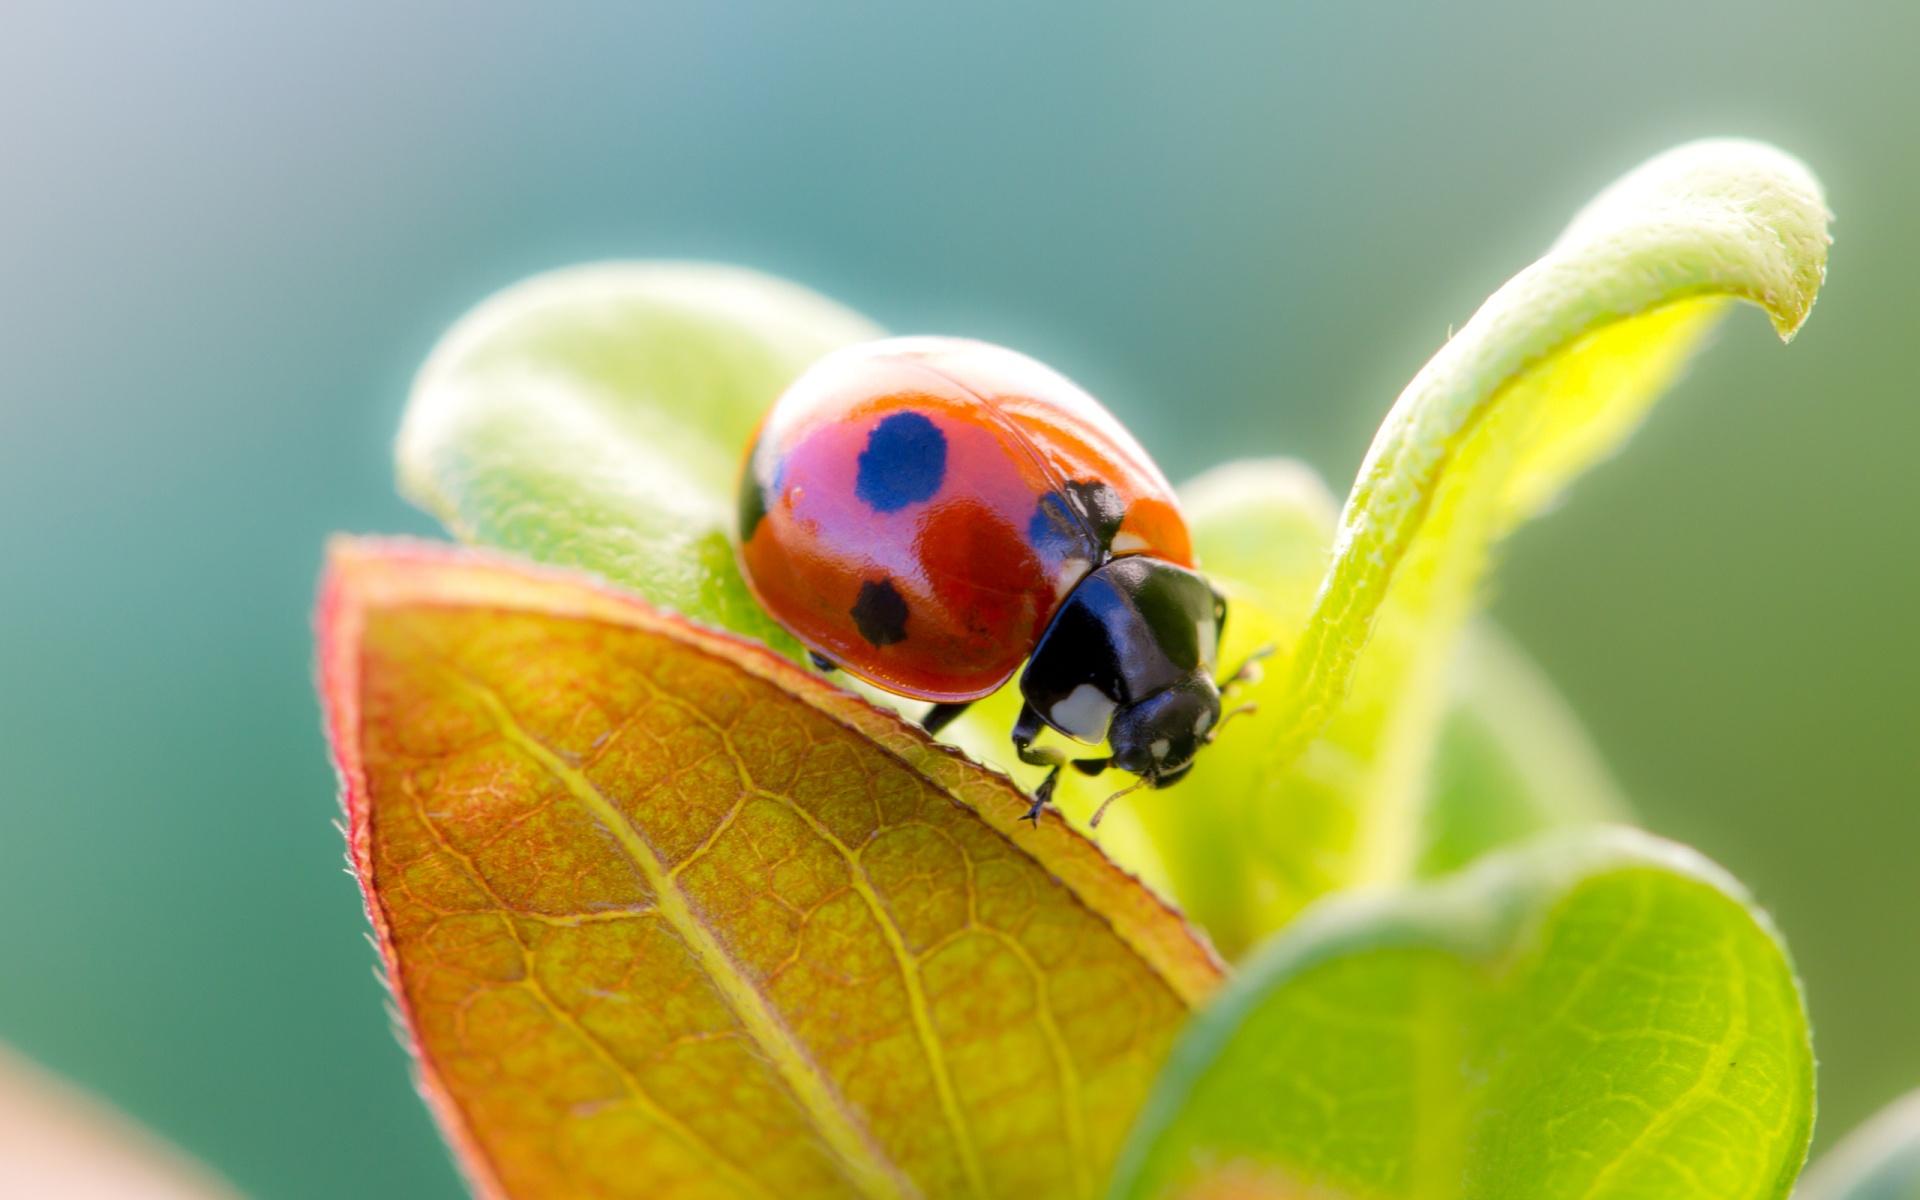 Ladybugs on flowers wallpaper